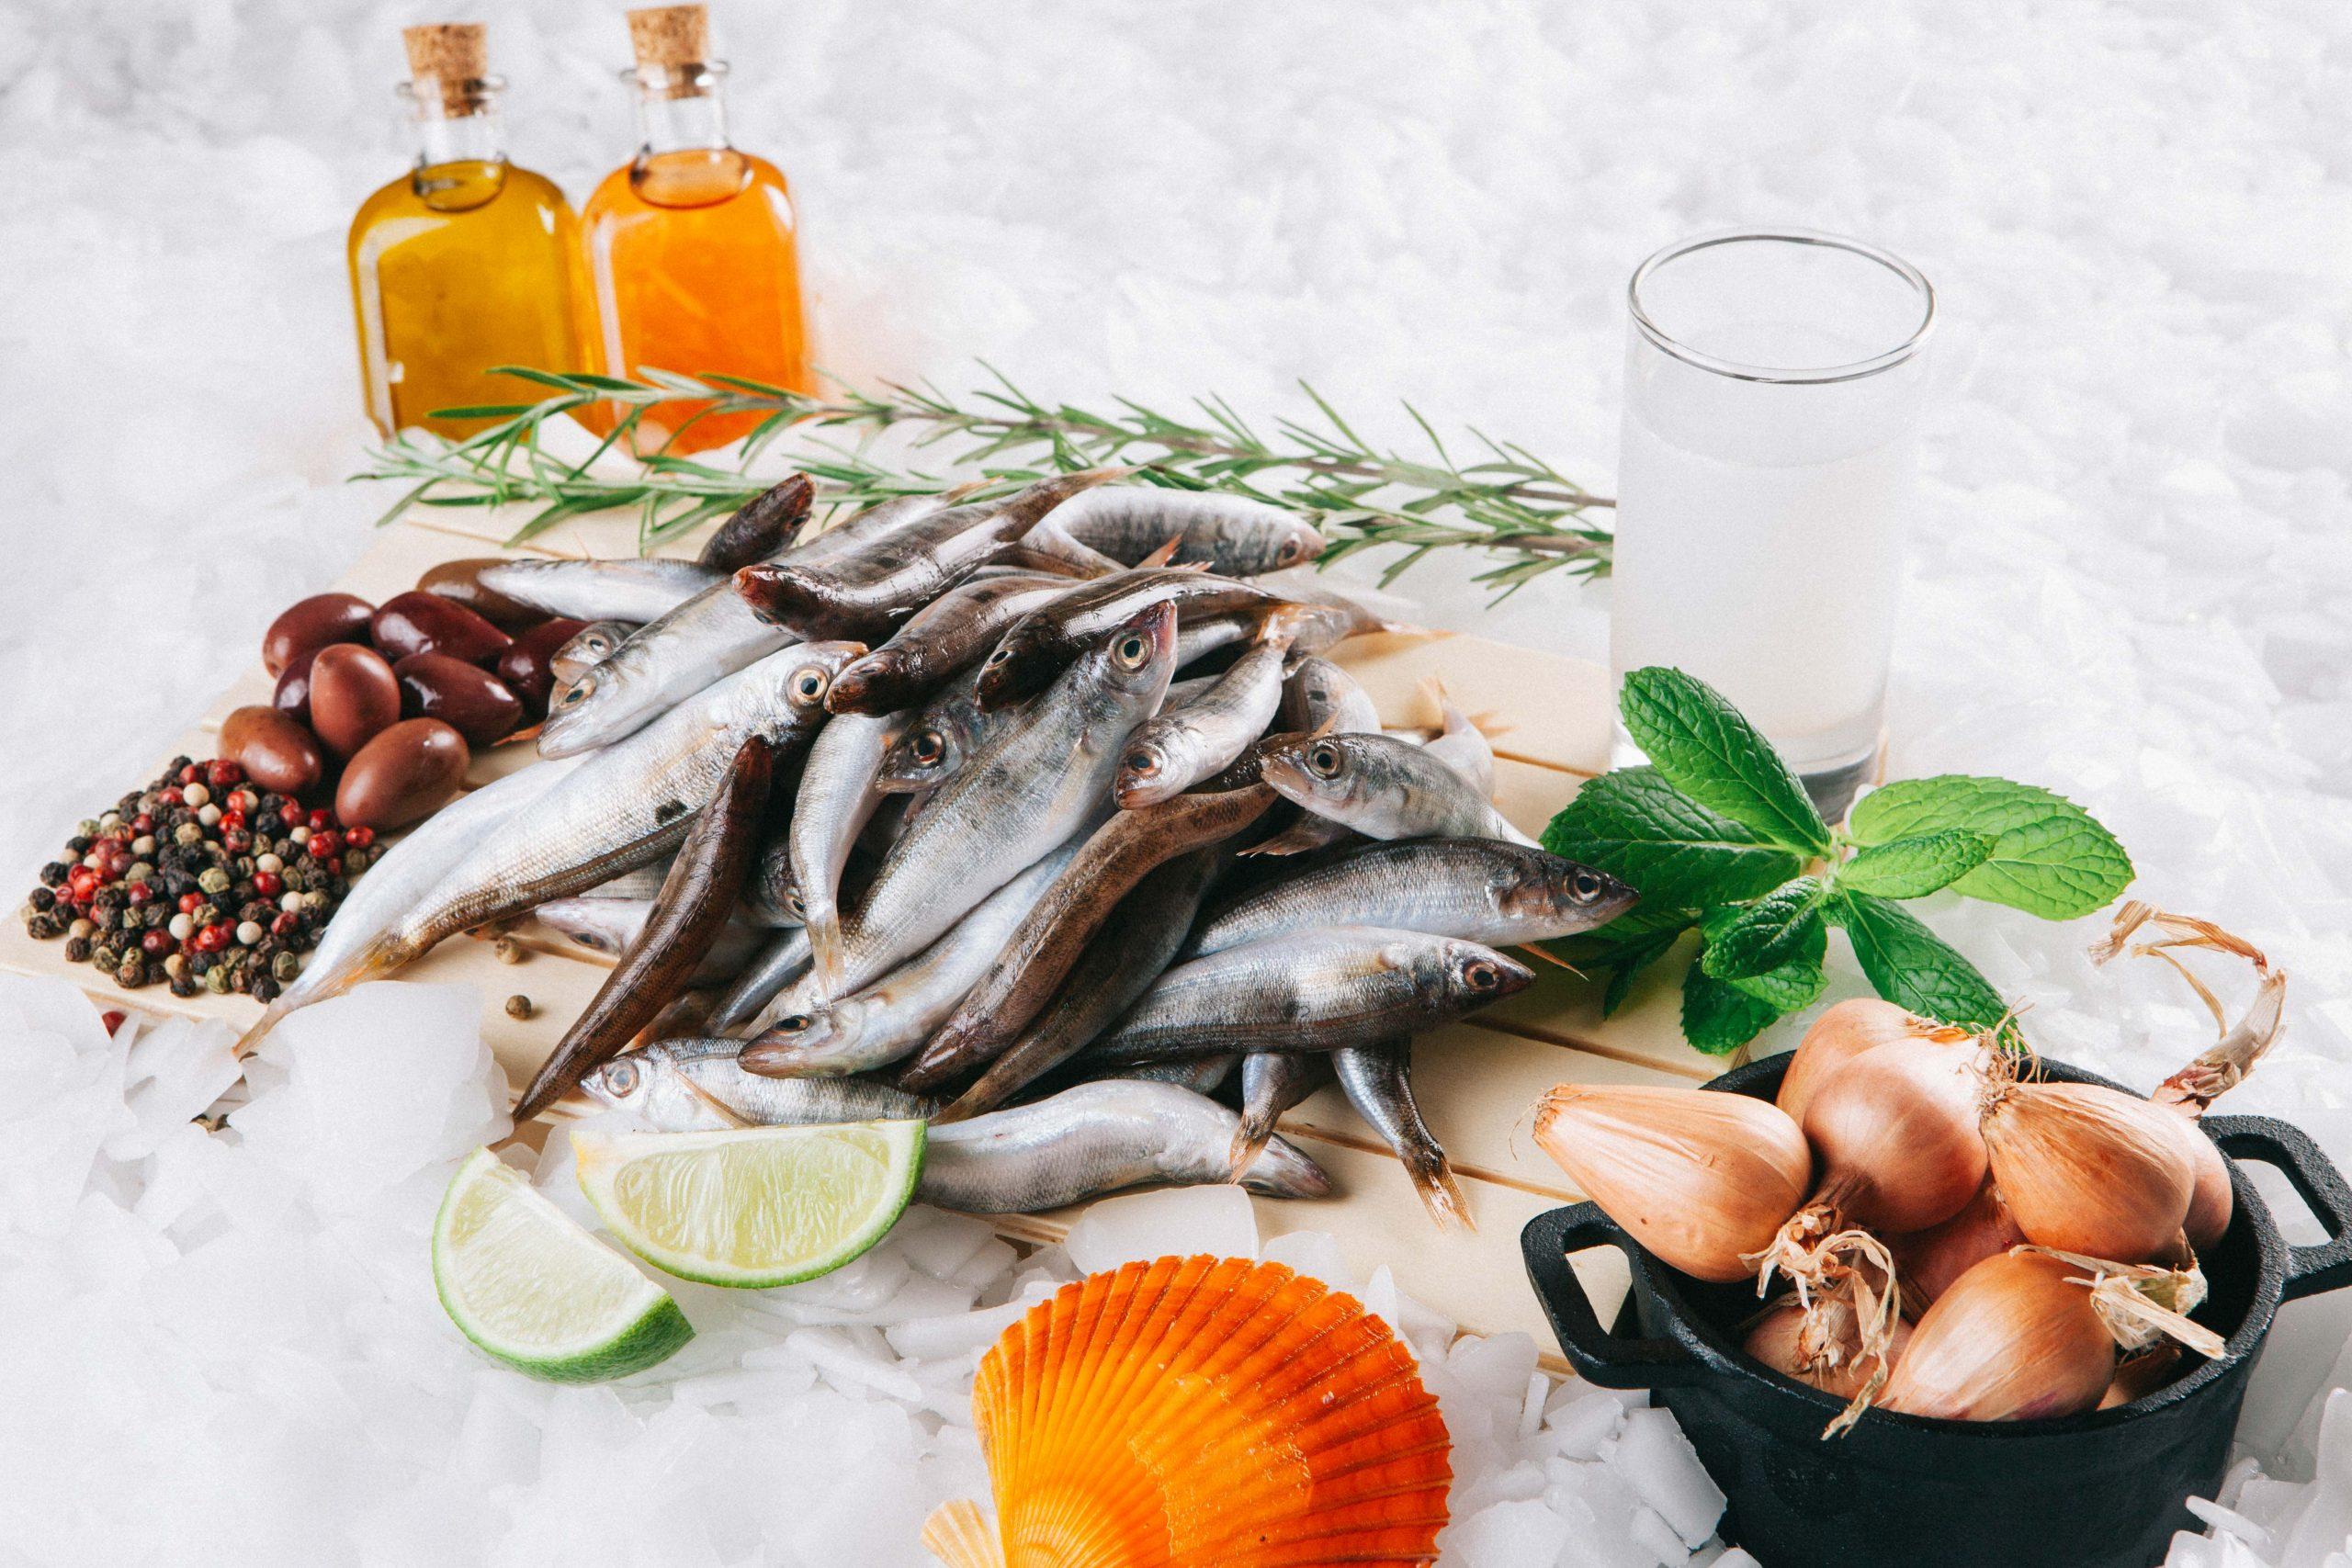 Super Fish Μαρίδα Ελλάδος